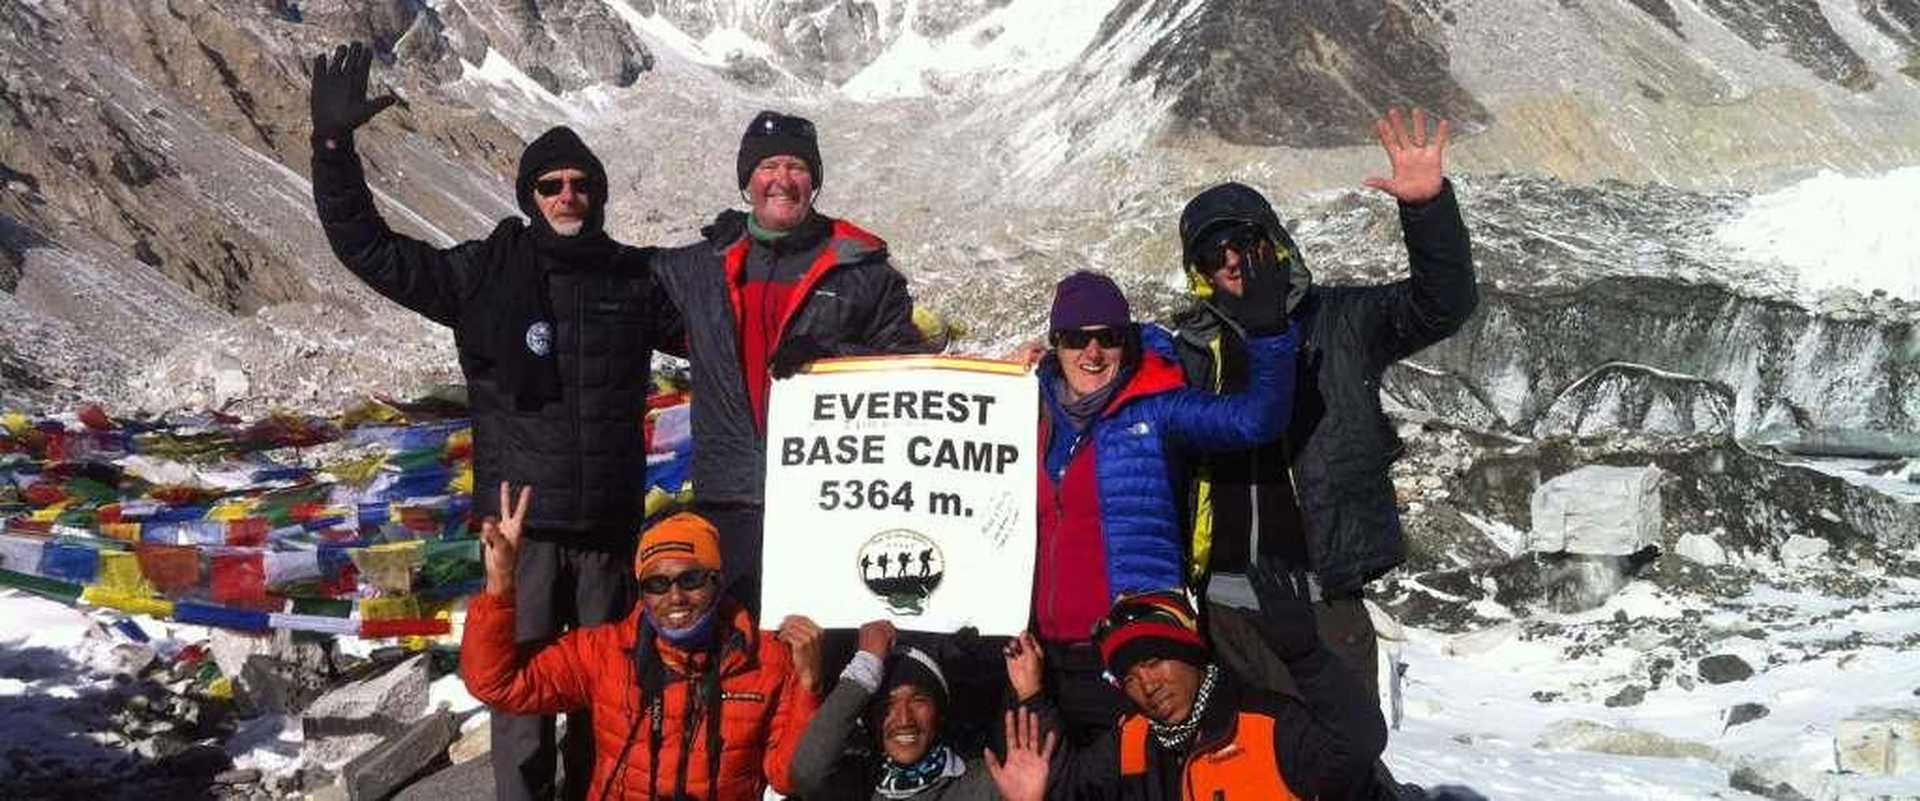 Kandoo's group at Everest Base camp